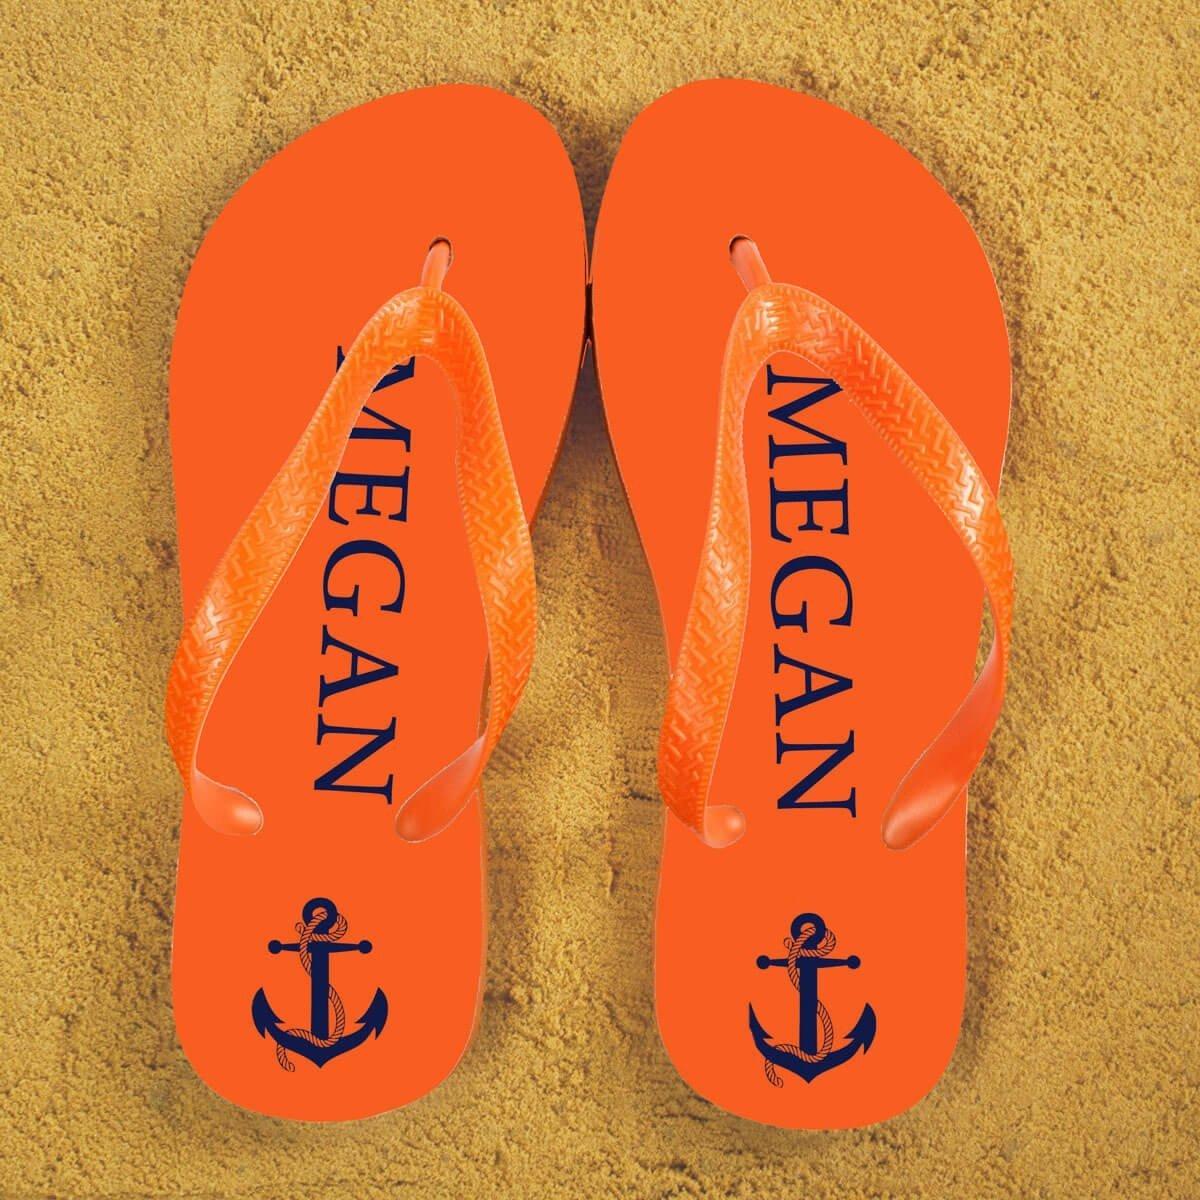 Personalised Adults Flip Flops (Orange & Blue) – Anchors